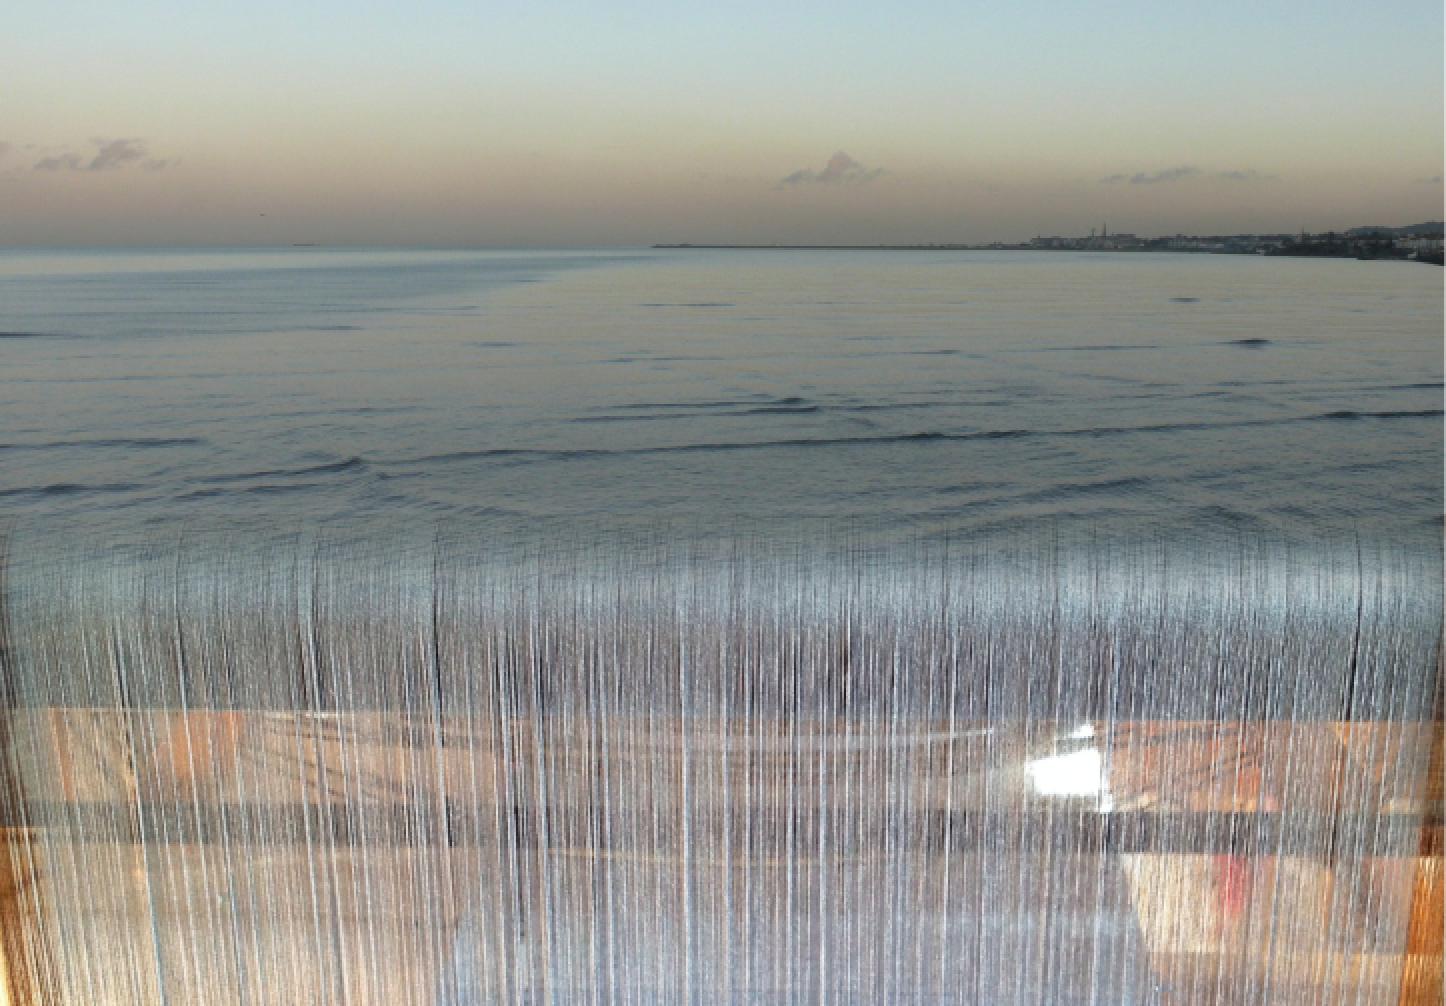 dublin-bay-horizonless-no-line-on-the-horizon